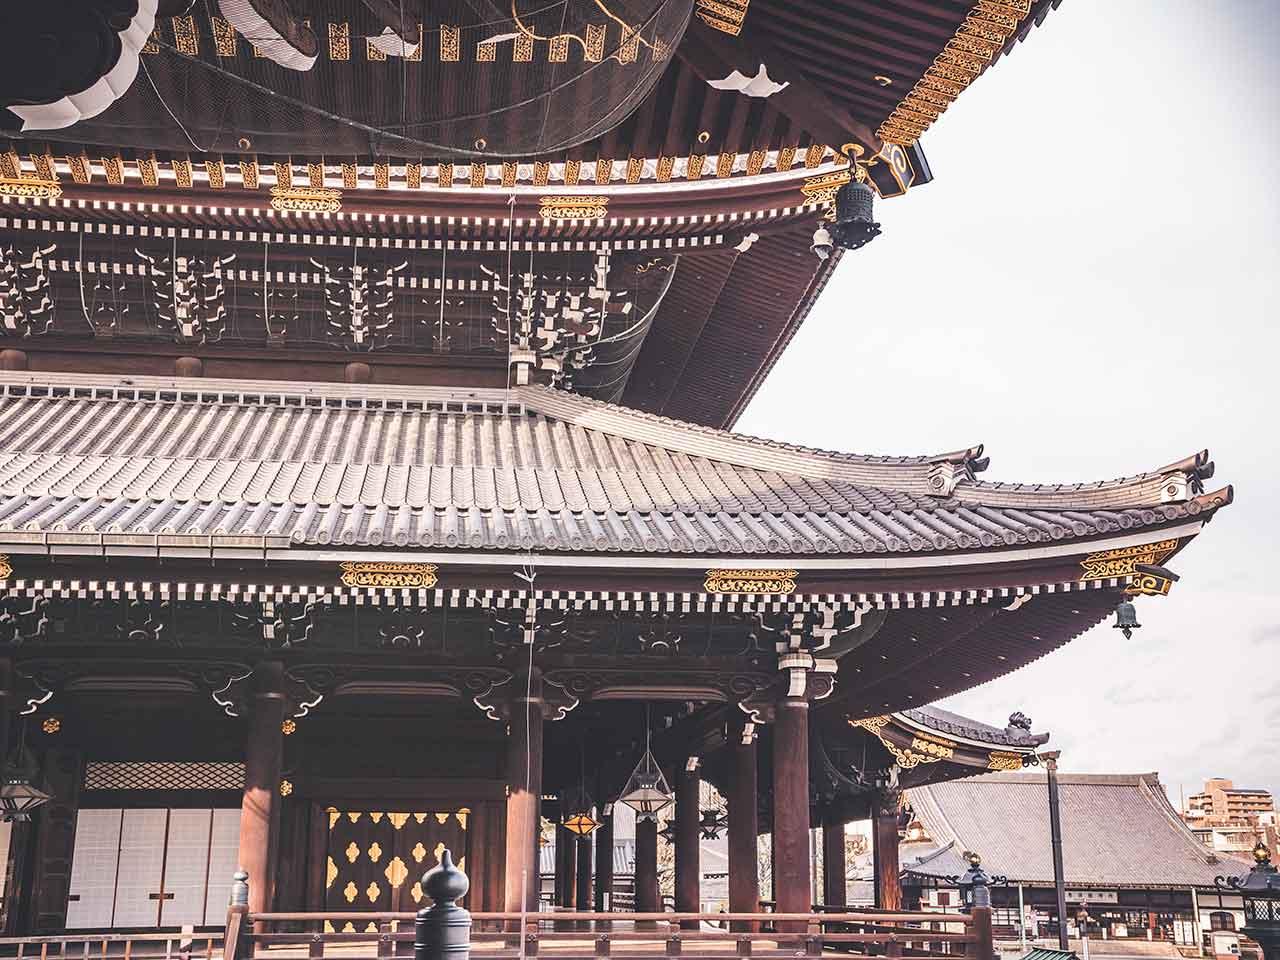 Hihashi Honganji Tempelanlage Nahaufnahme